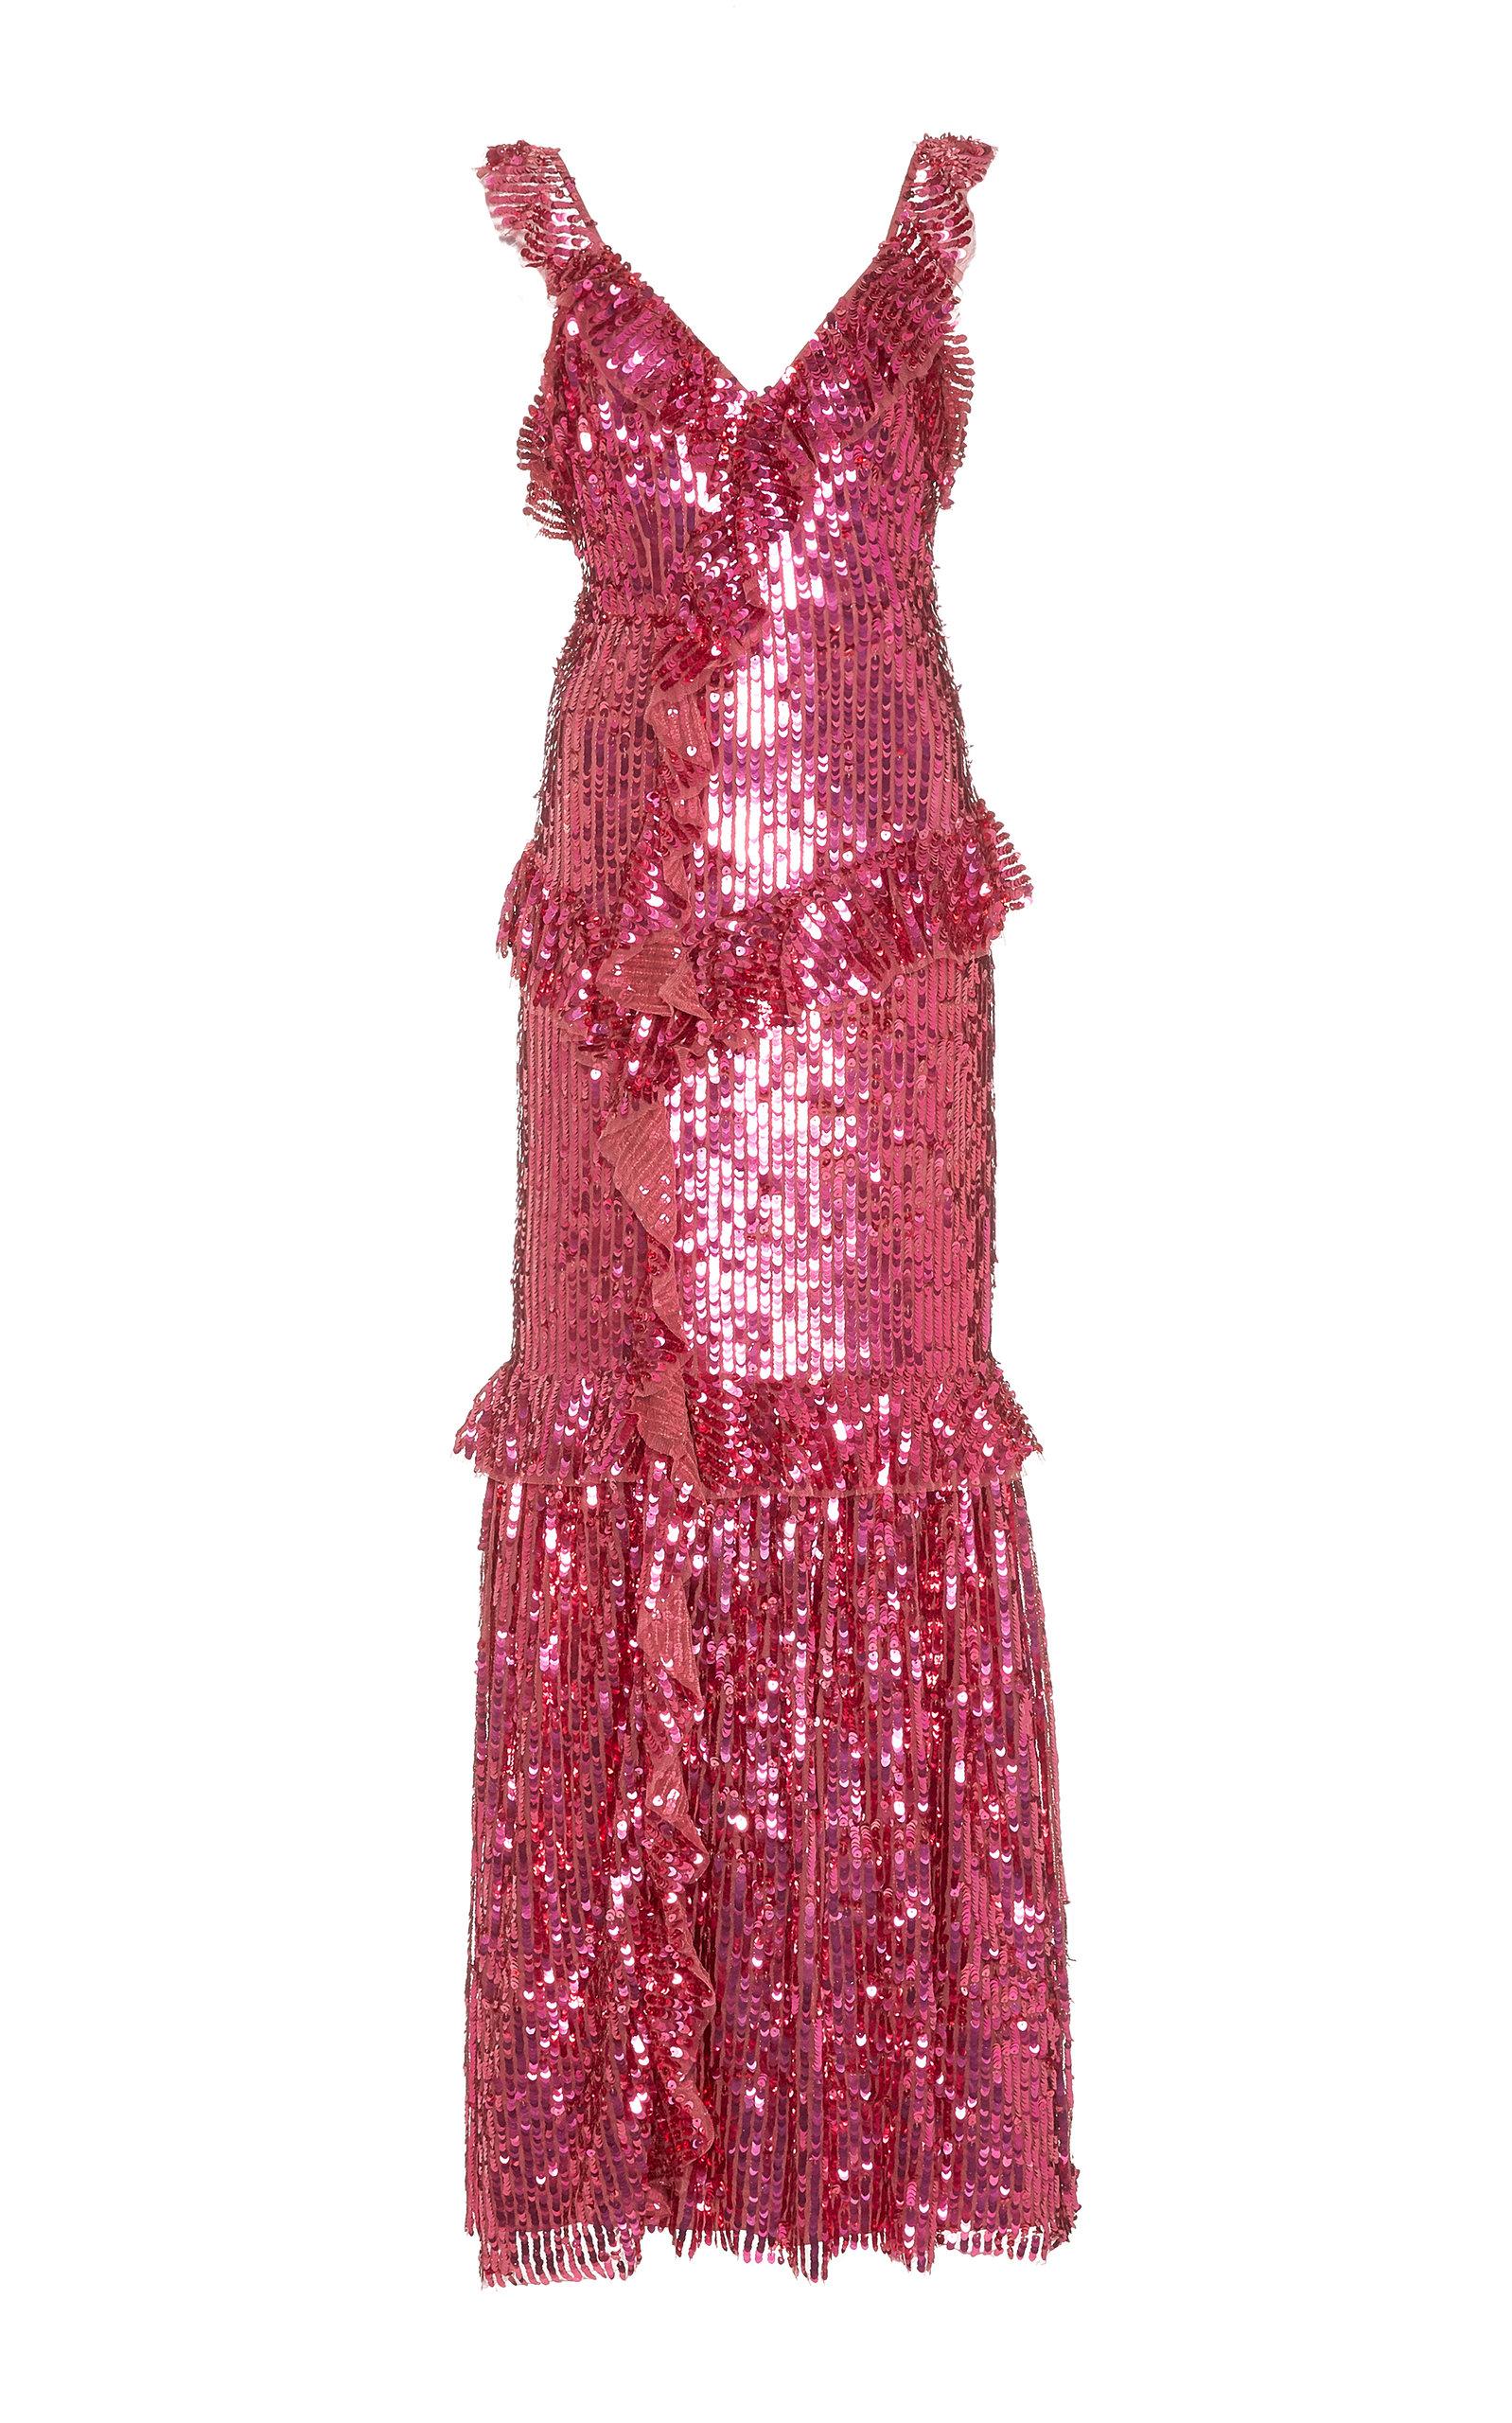 Needle & Thread Dresses Scarlett V-neck Sequined Midi Gown